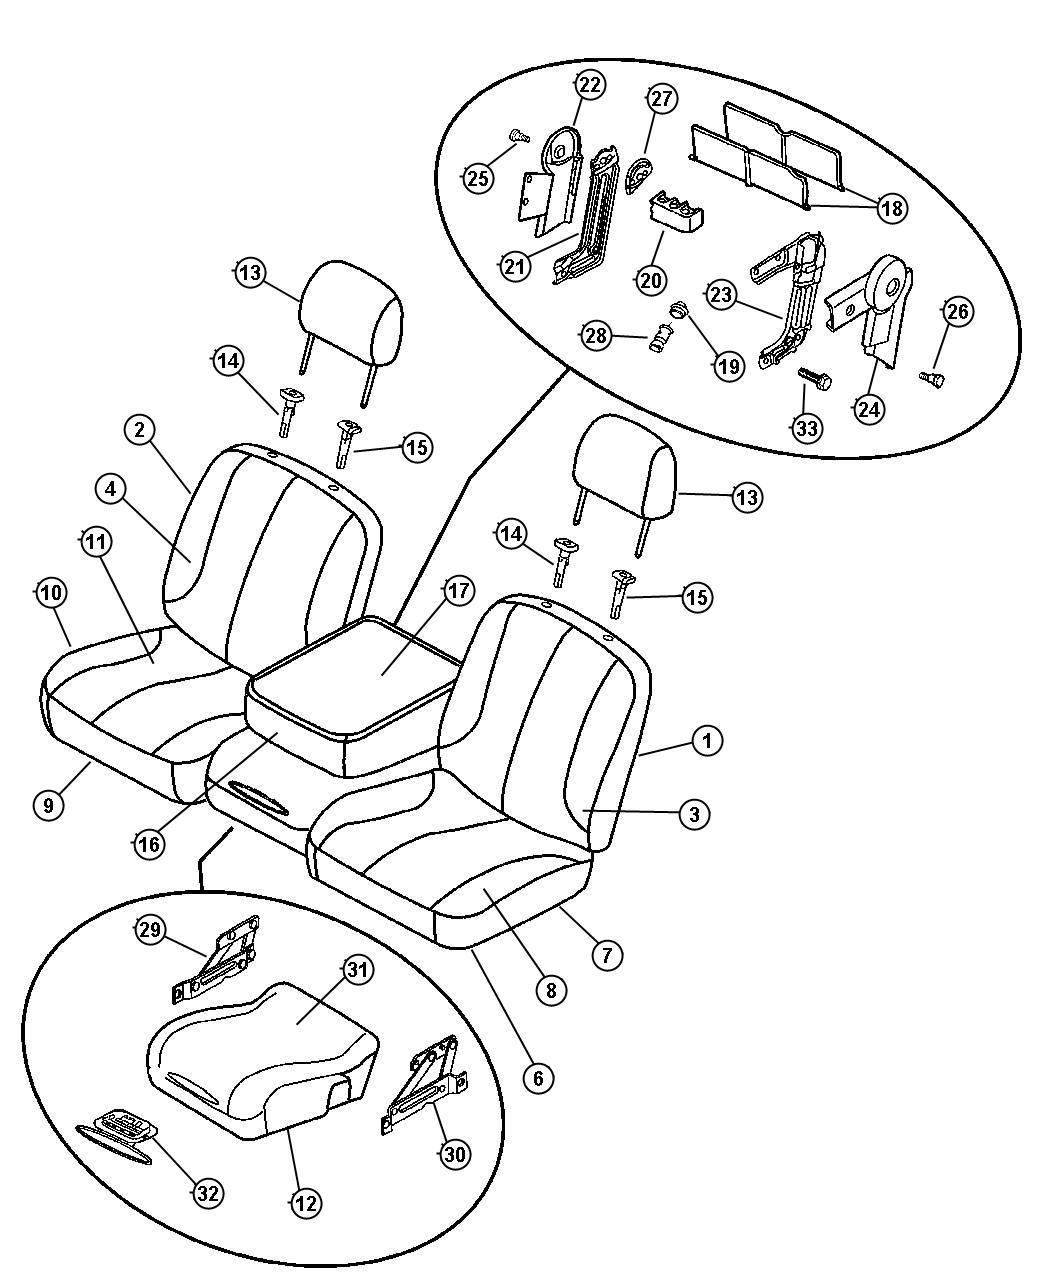 Dodge Ram Pad Front Seat Cushion Trim Seat